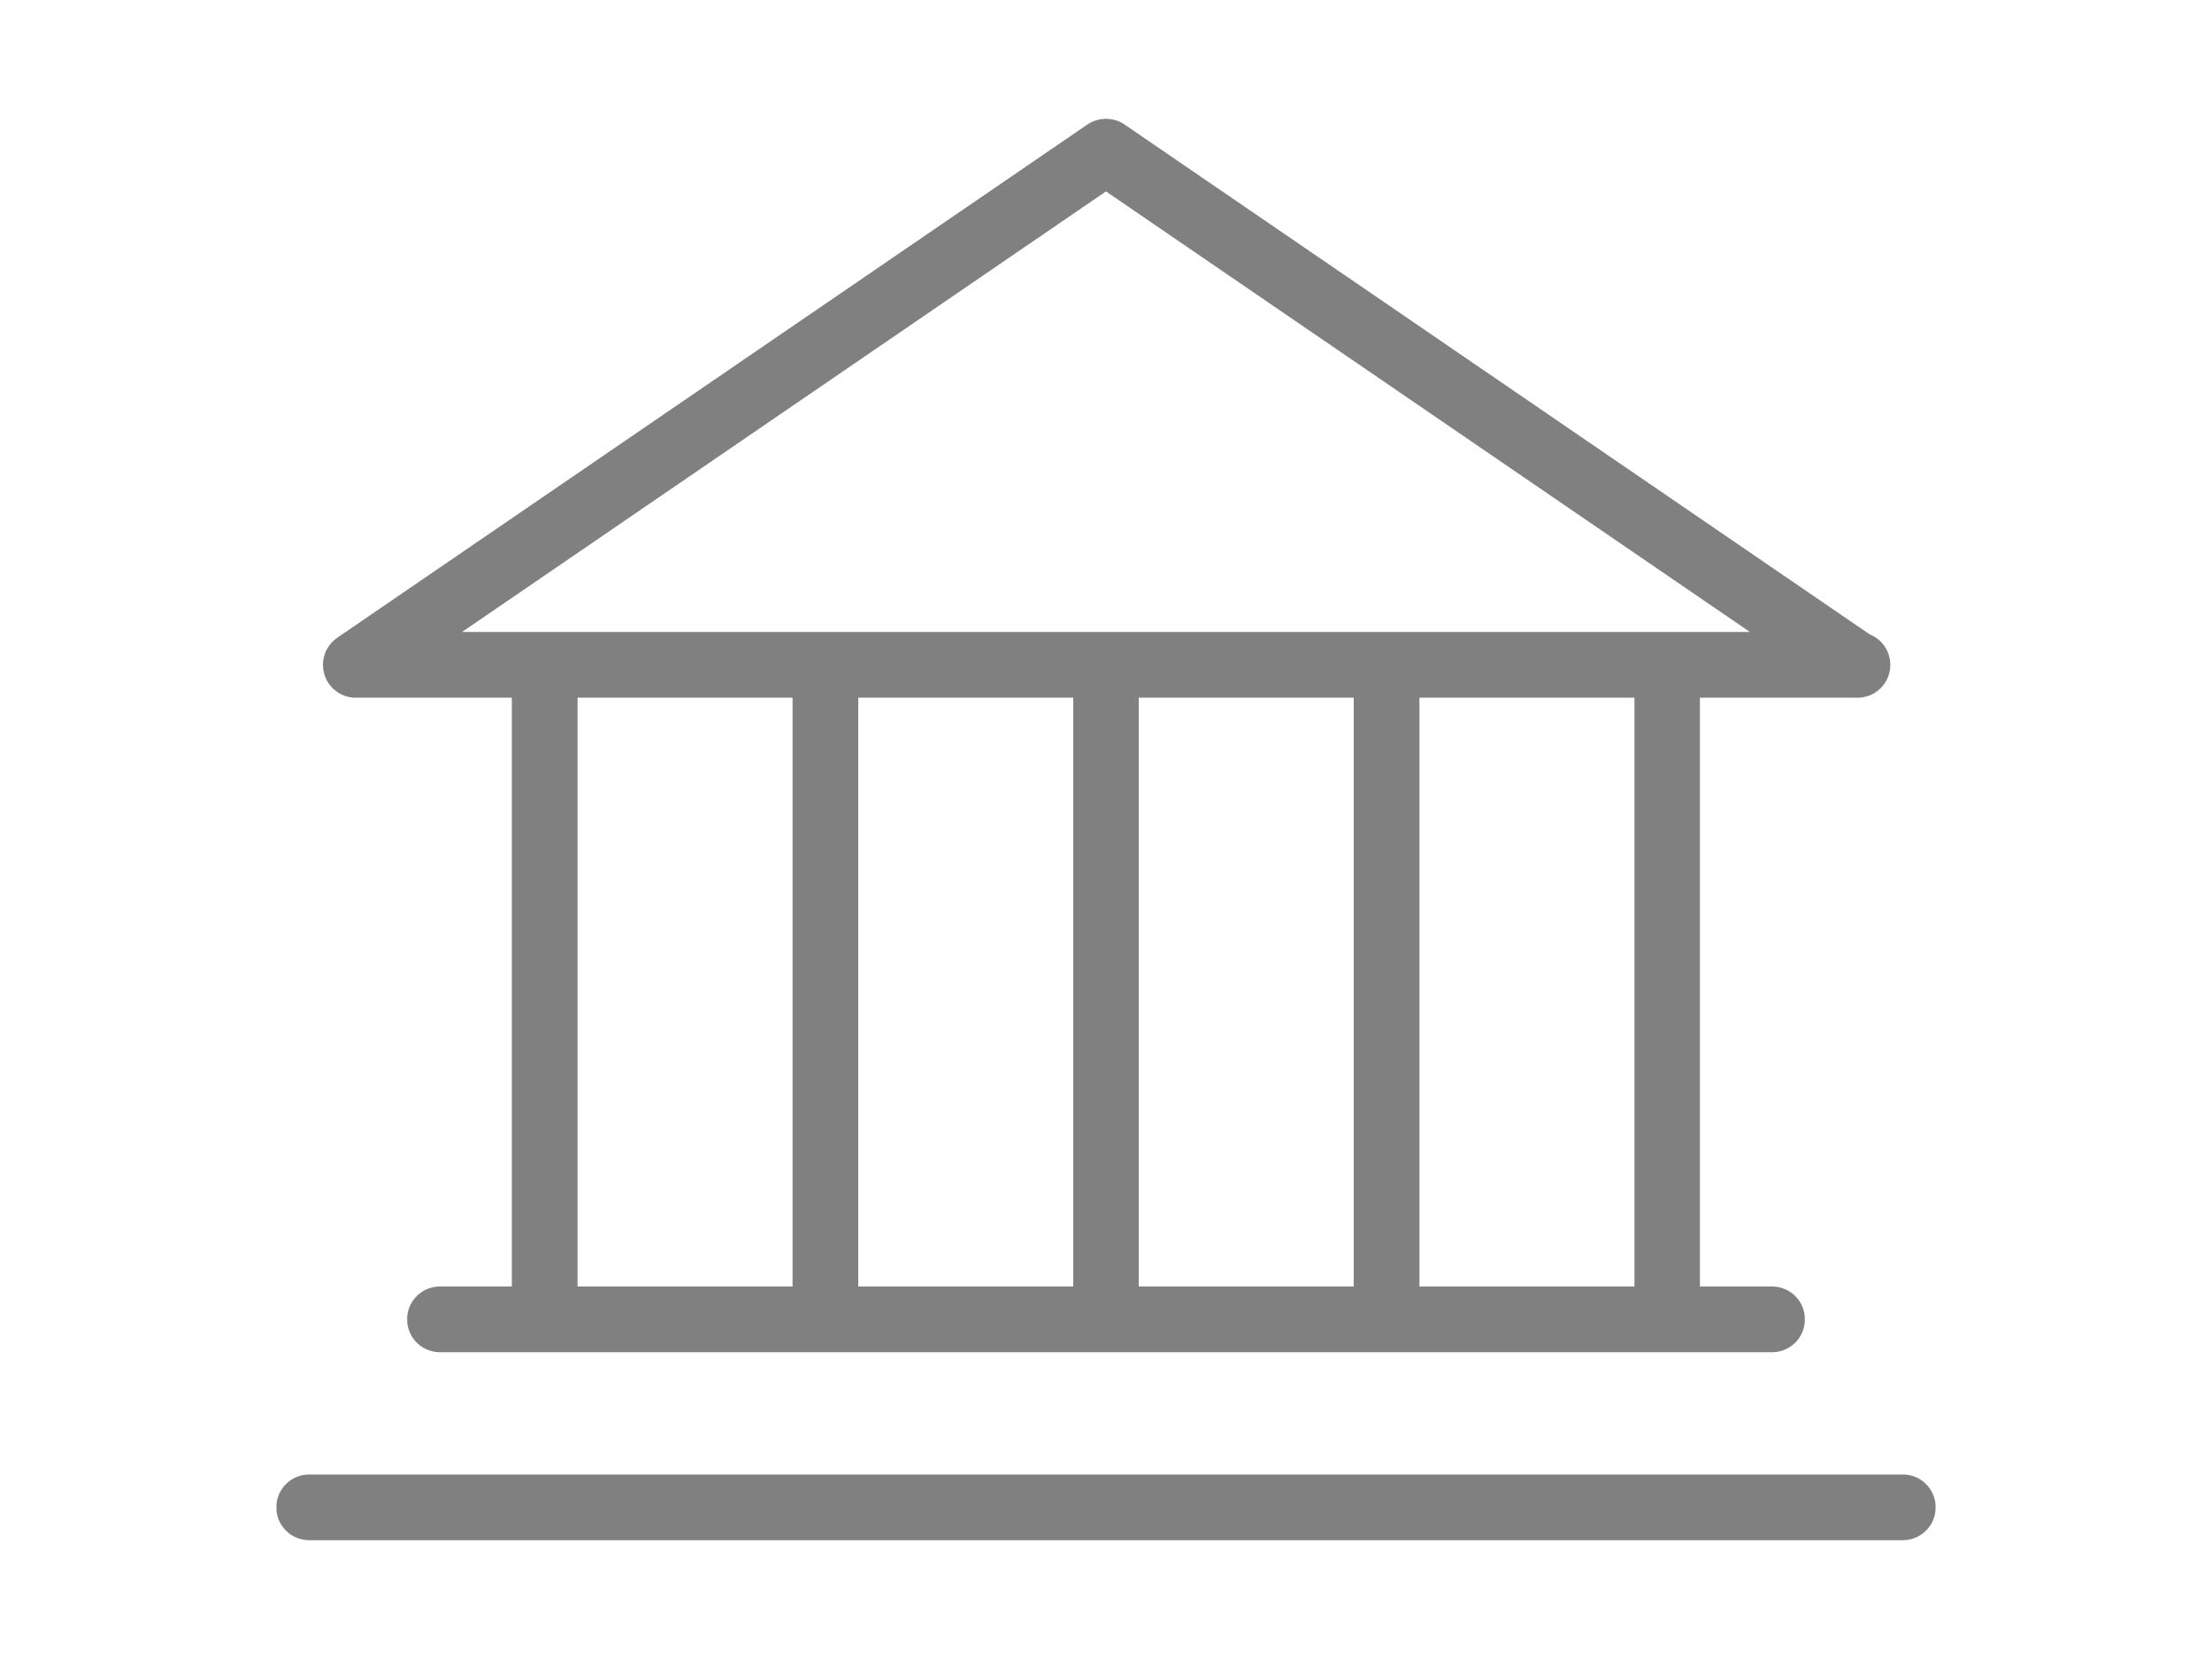 bank_integration_icon.jpg